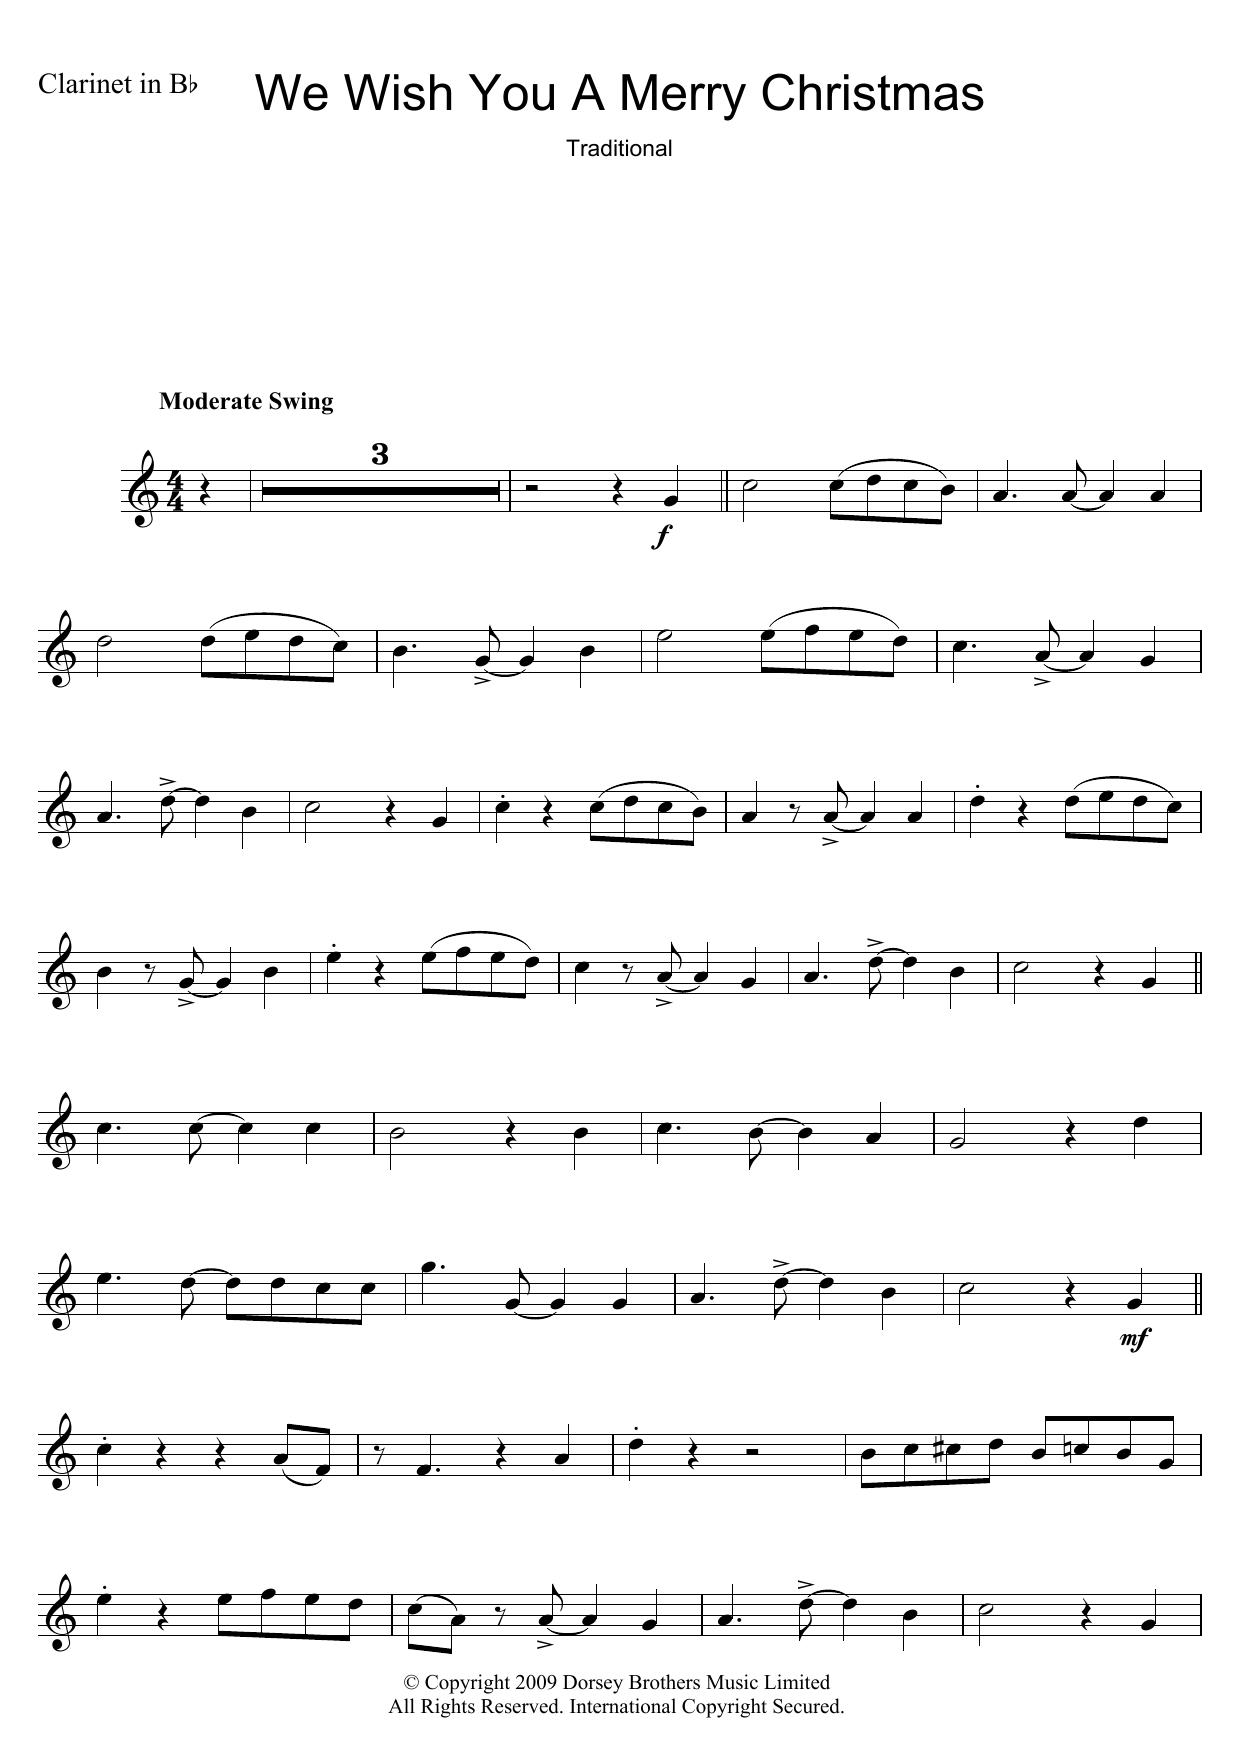 Clarinet Sheet Music Christmas.We Wish You A Merry Christmas By Christmas Carol Keyboard Abridged Digital Sheet Music